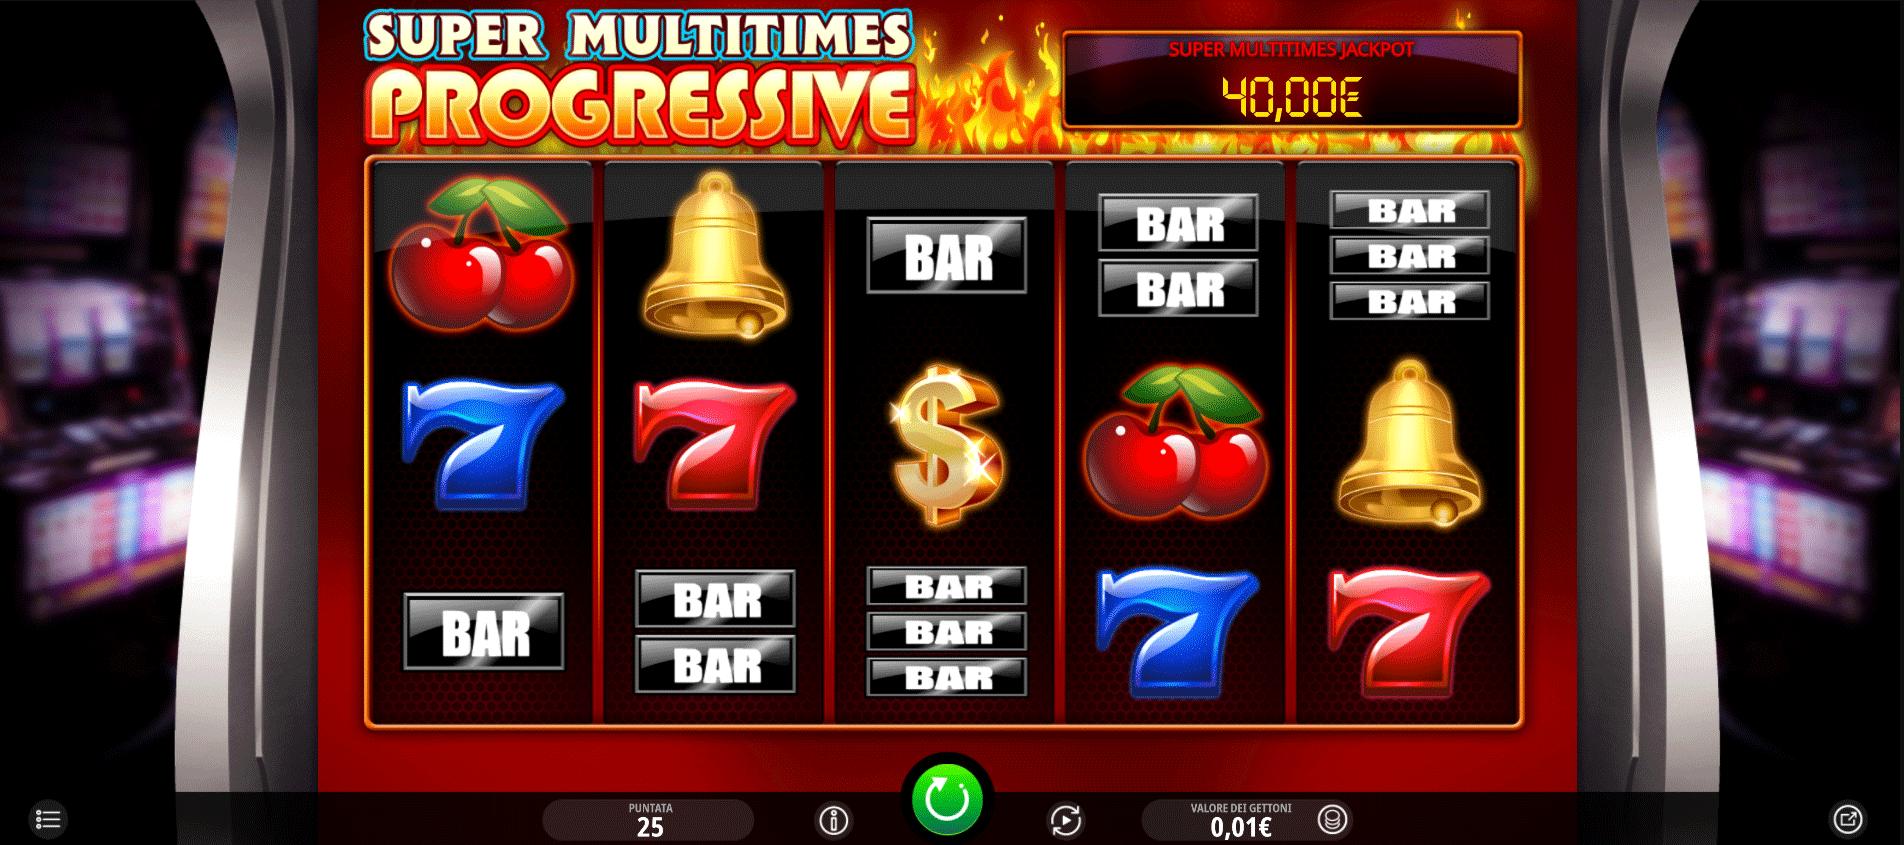 Slot Super Multitimes Progressive